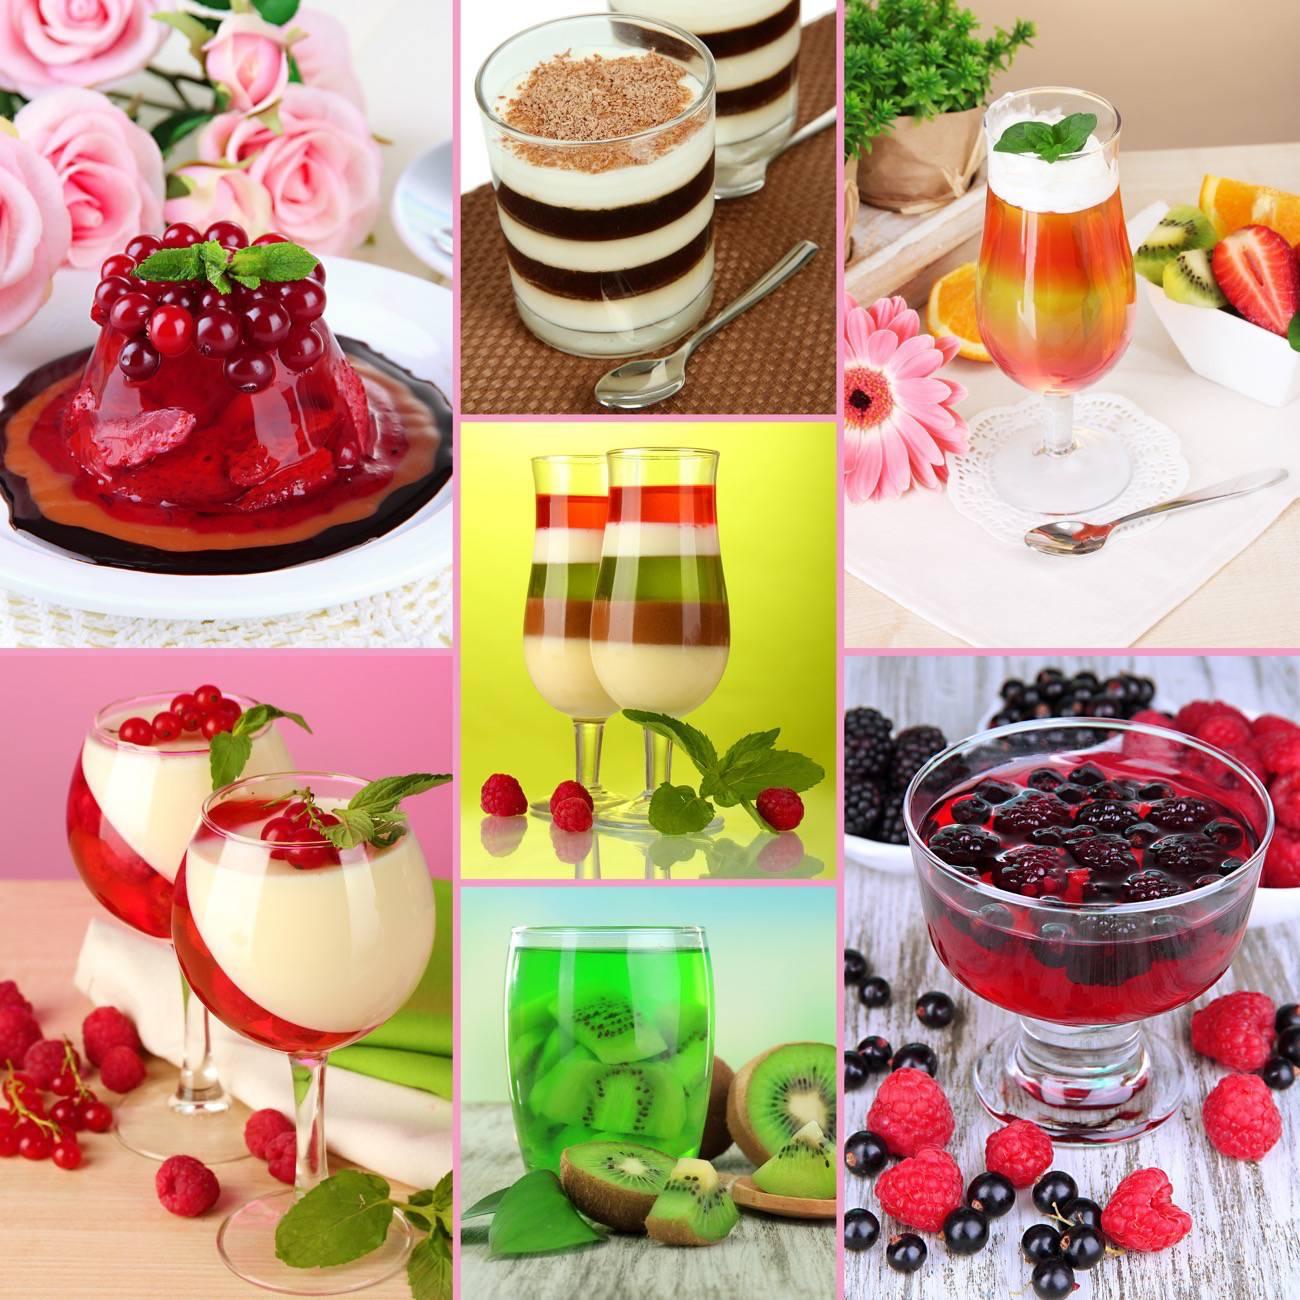 comer fruta con gelatina